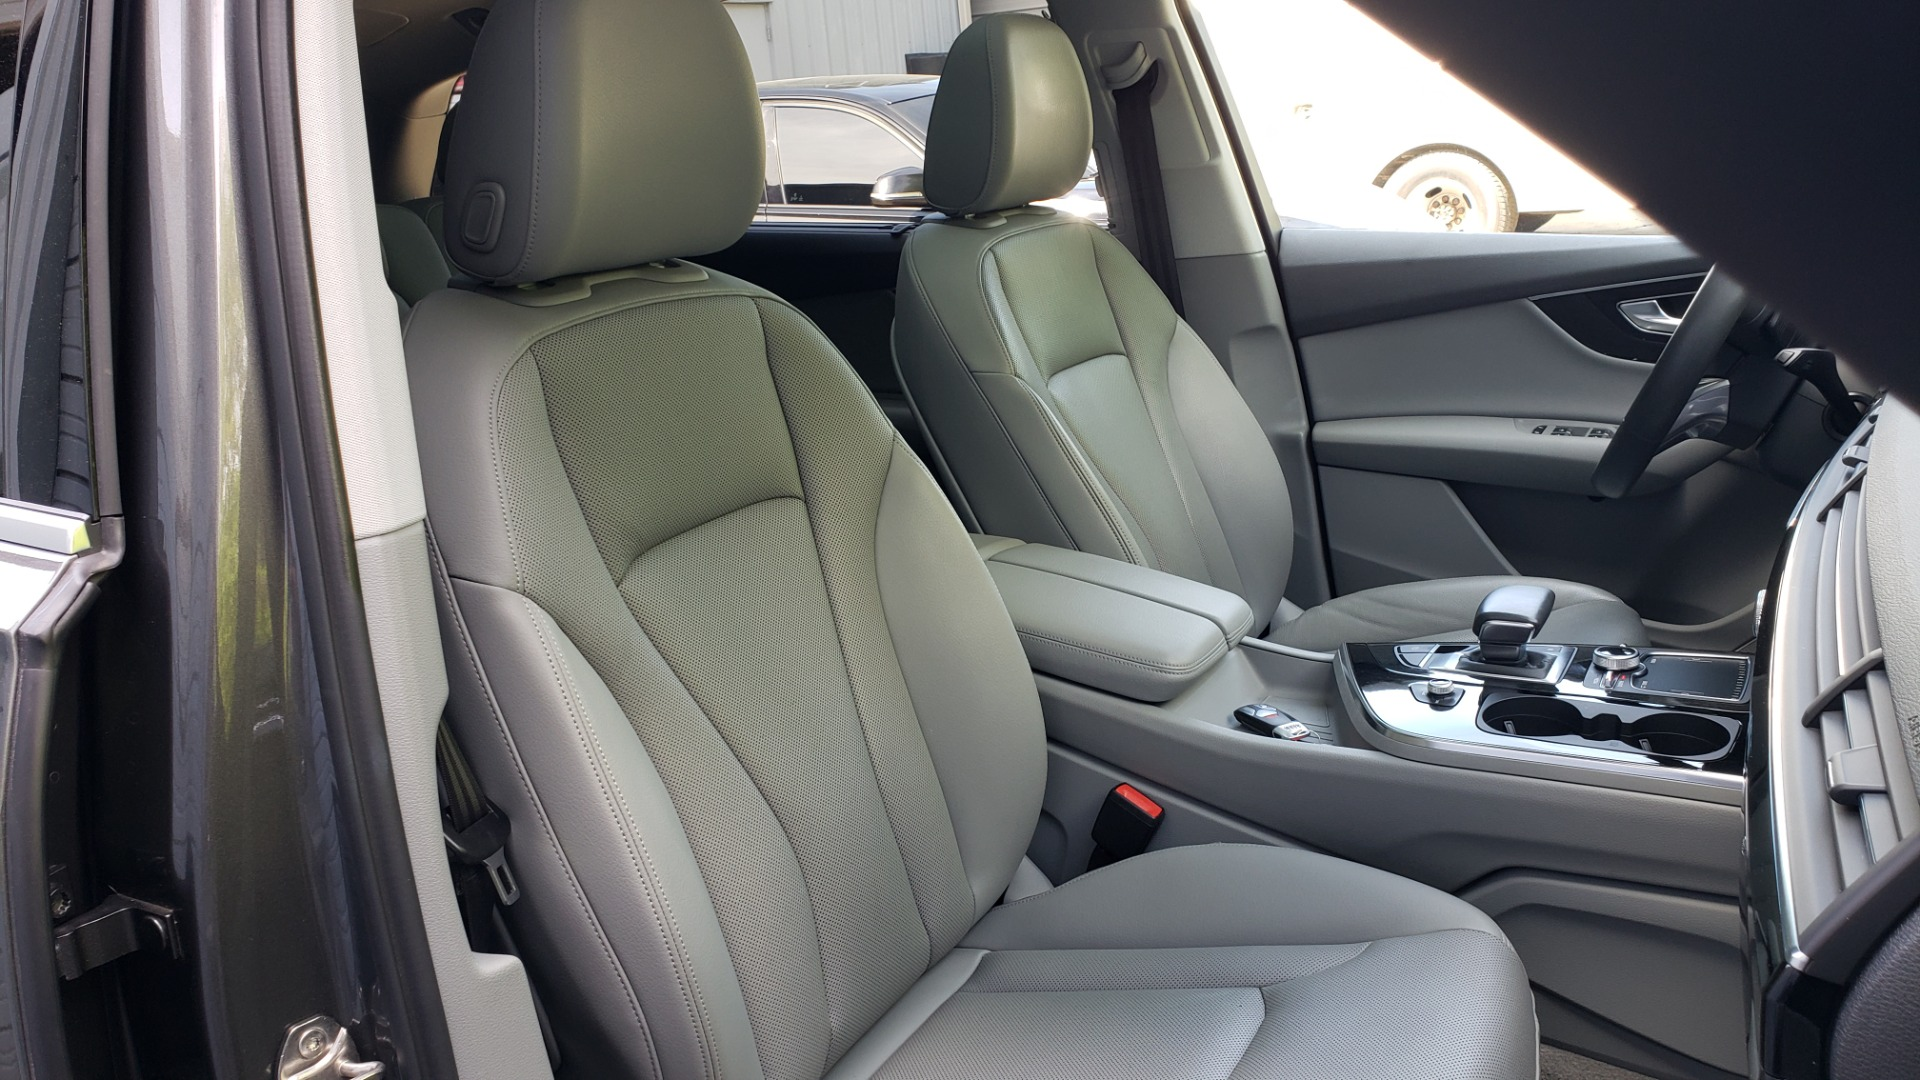 Used 2018 Audi Q7 PRESTIGE TIPTRONIC / NAV / SUNROOF / ADAPTIVE PKG / DRVR ASST / CLD WTHR /  for sale $49,995 at Formula Imports in Charlotte NC 28227 72